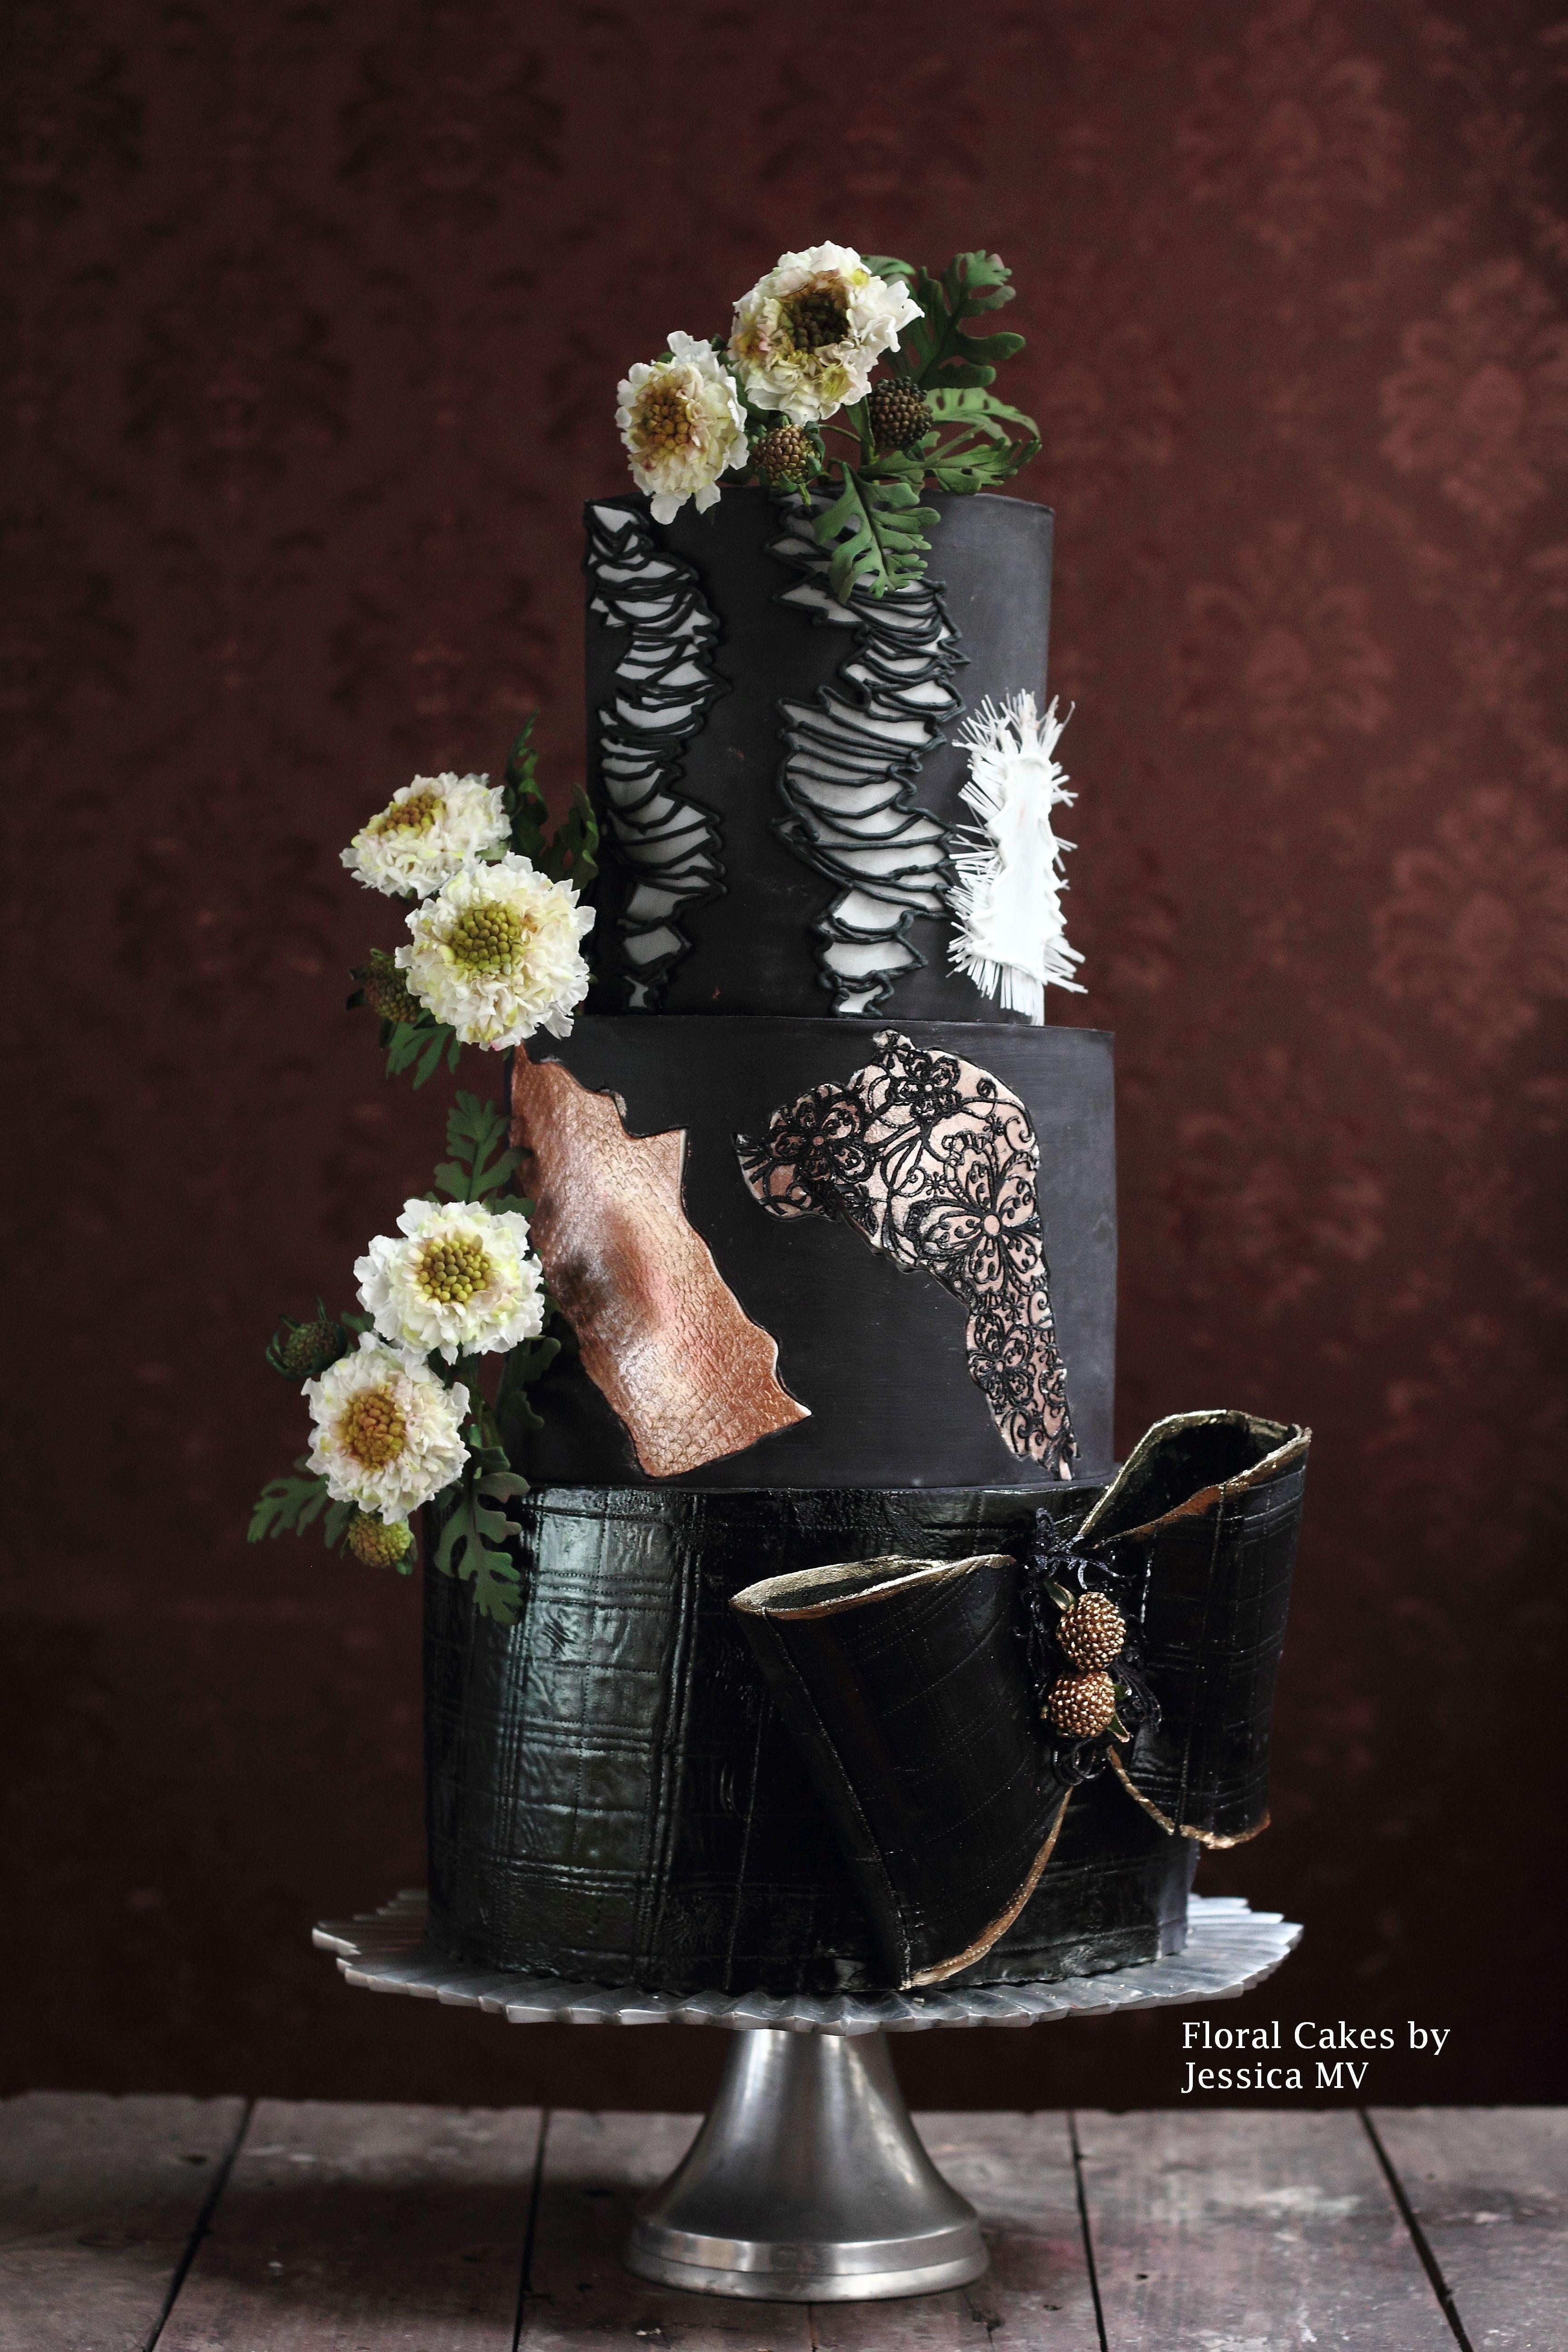 Black with sugar daisies